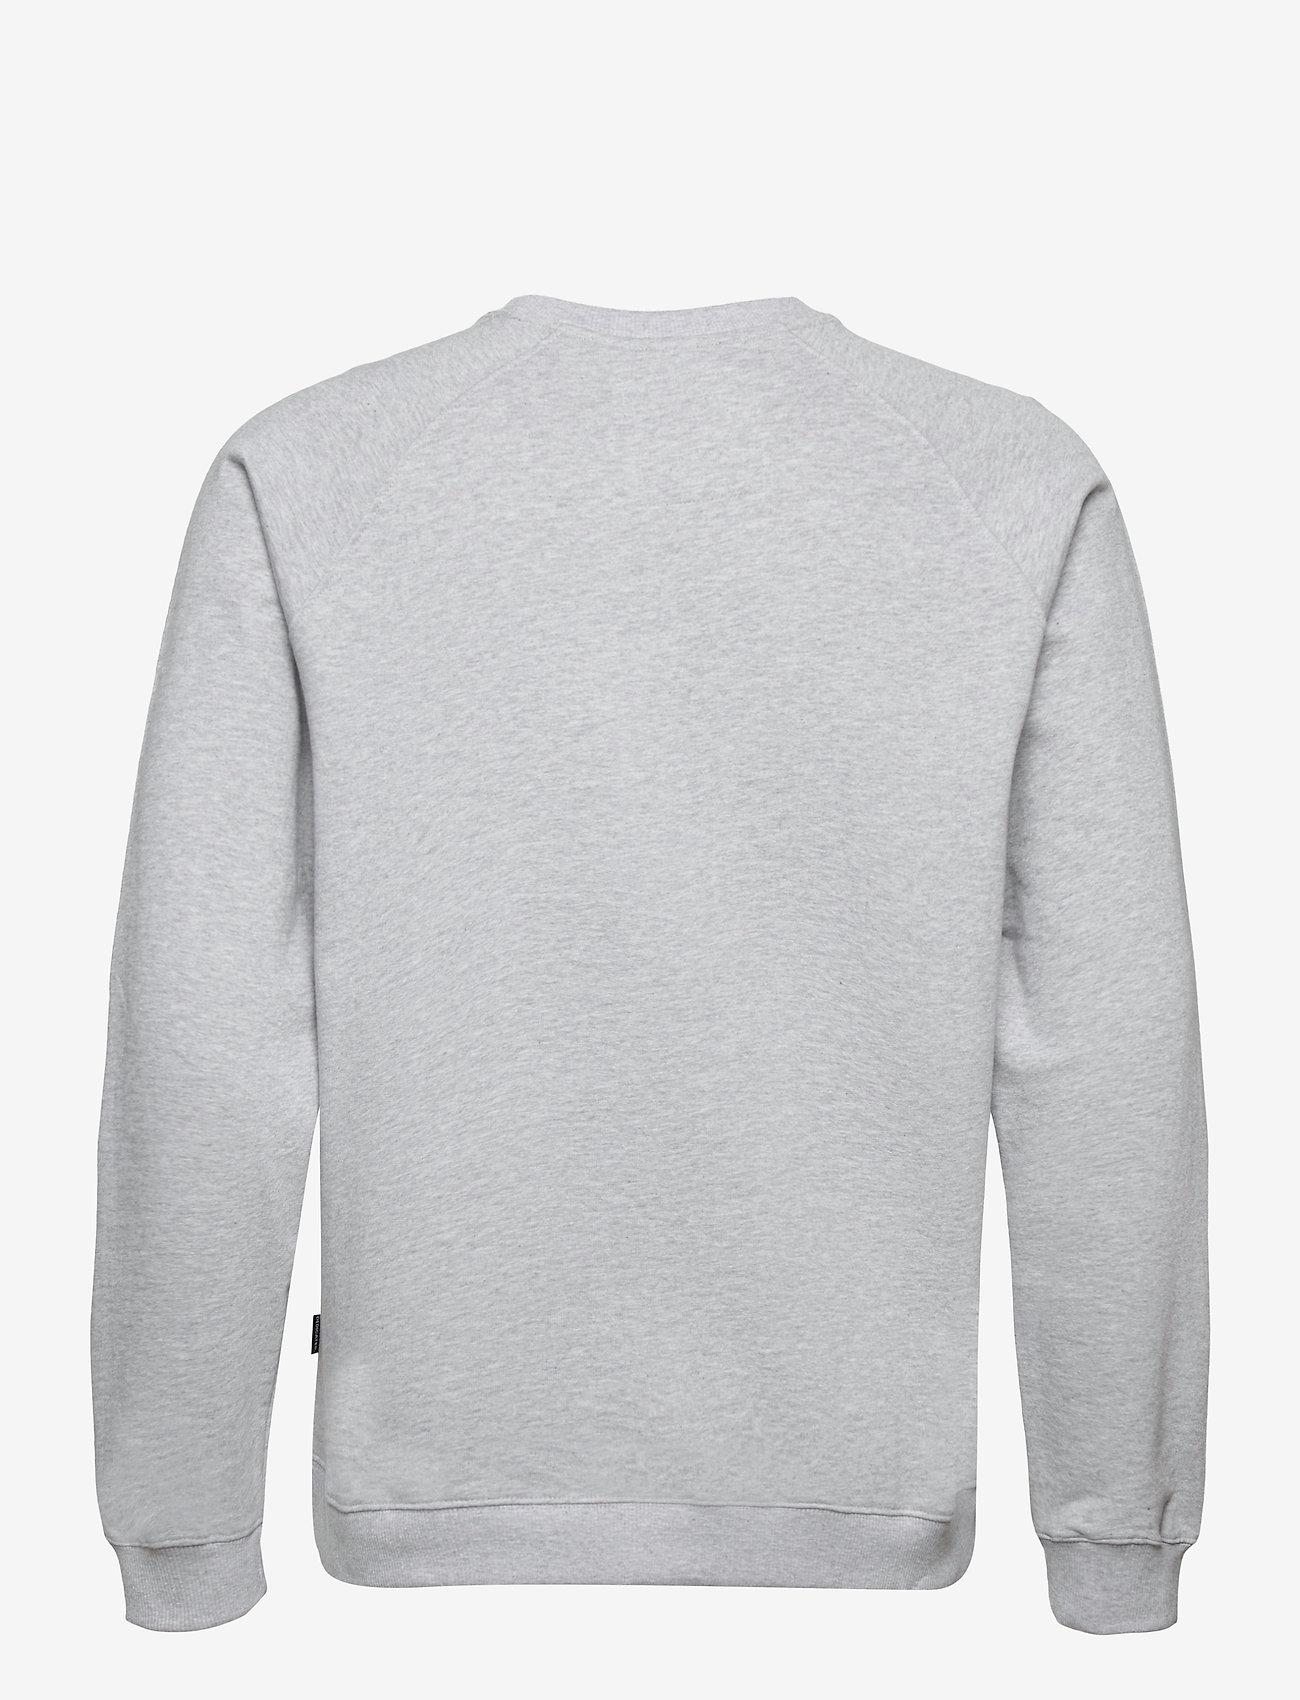 DEDICATED - Sweatshirt Malmoe Peanuts Logo Grey Melange - sweats - grey melange - 1